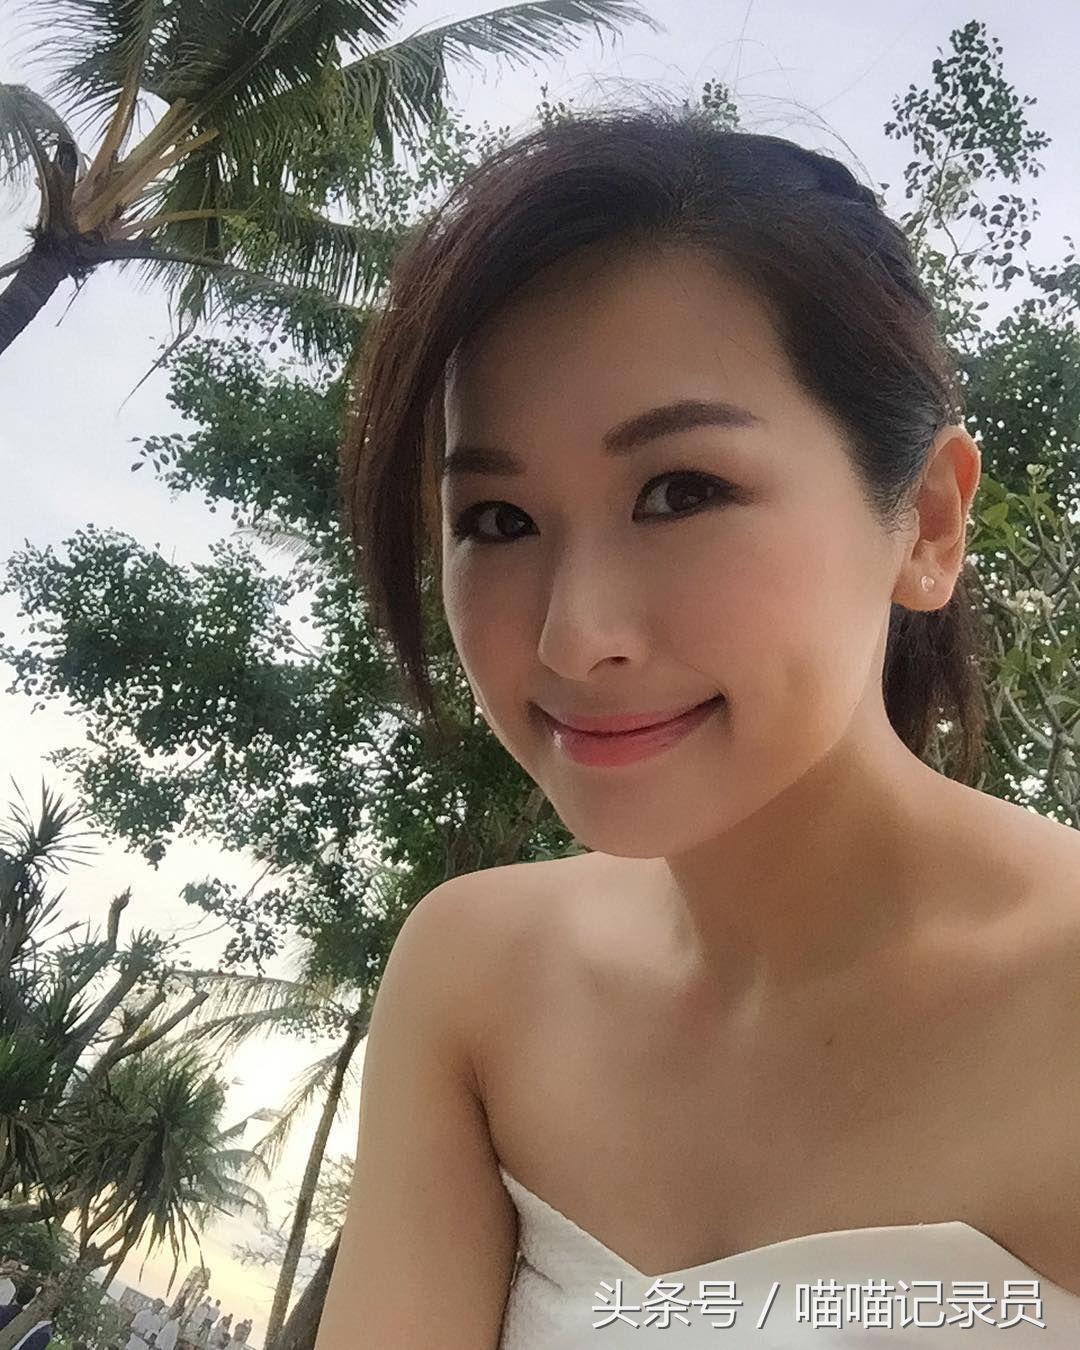 """TVB御用女奸角""竟是亿万财产的富二代,演戏纯为兴趣"